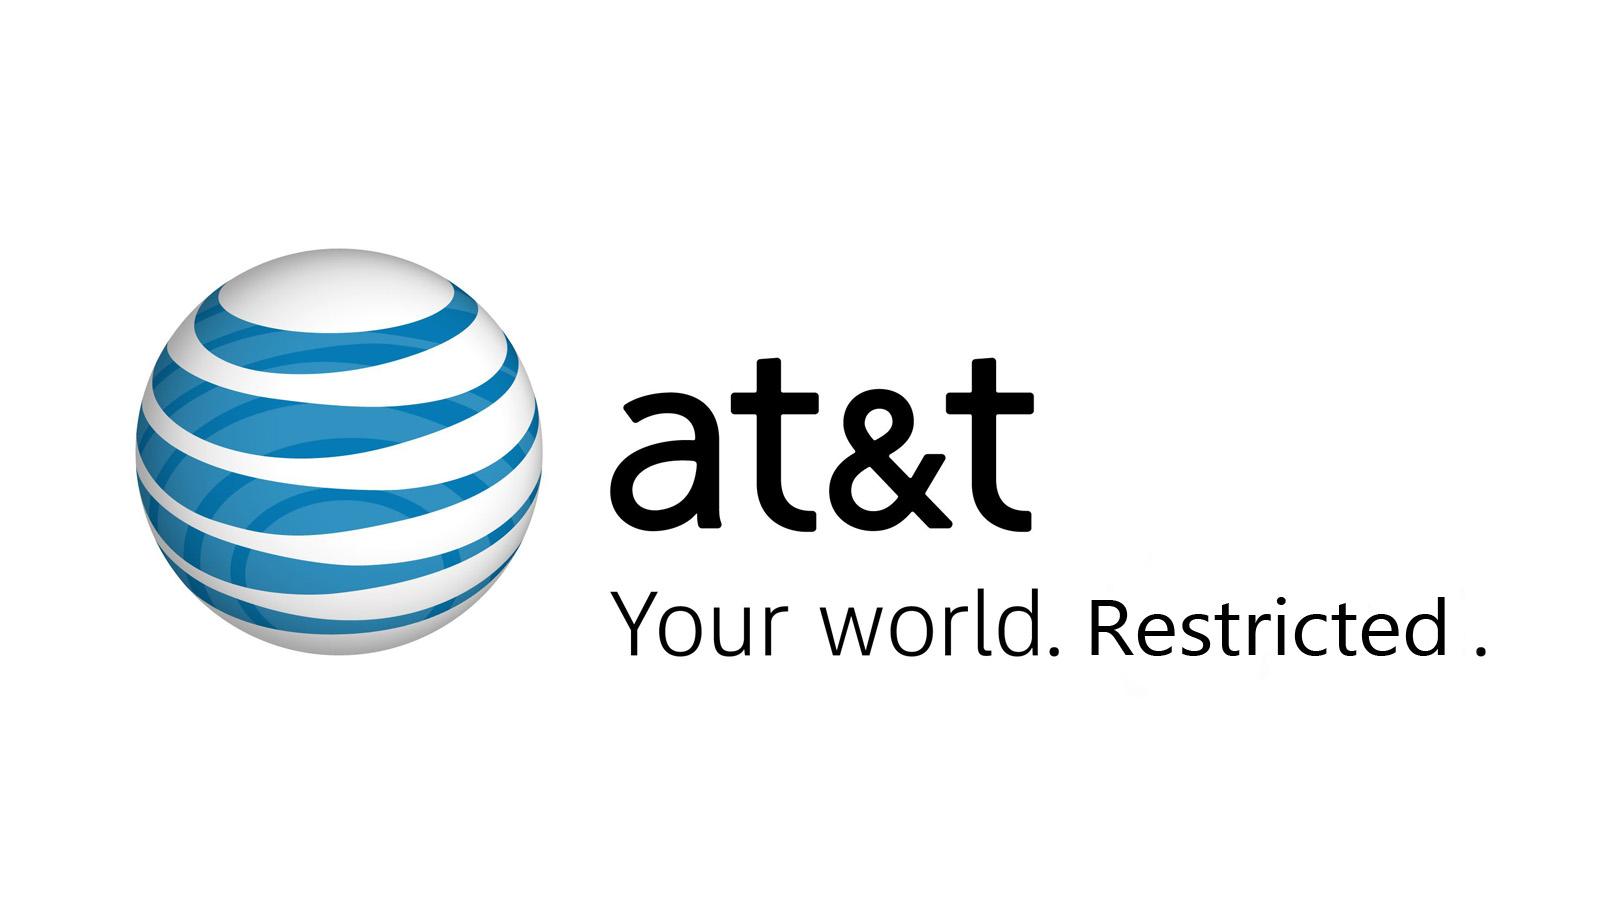 AT&T ofrece por 70dlls 300Mbps a cambio de espionaje